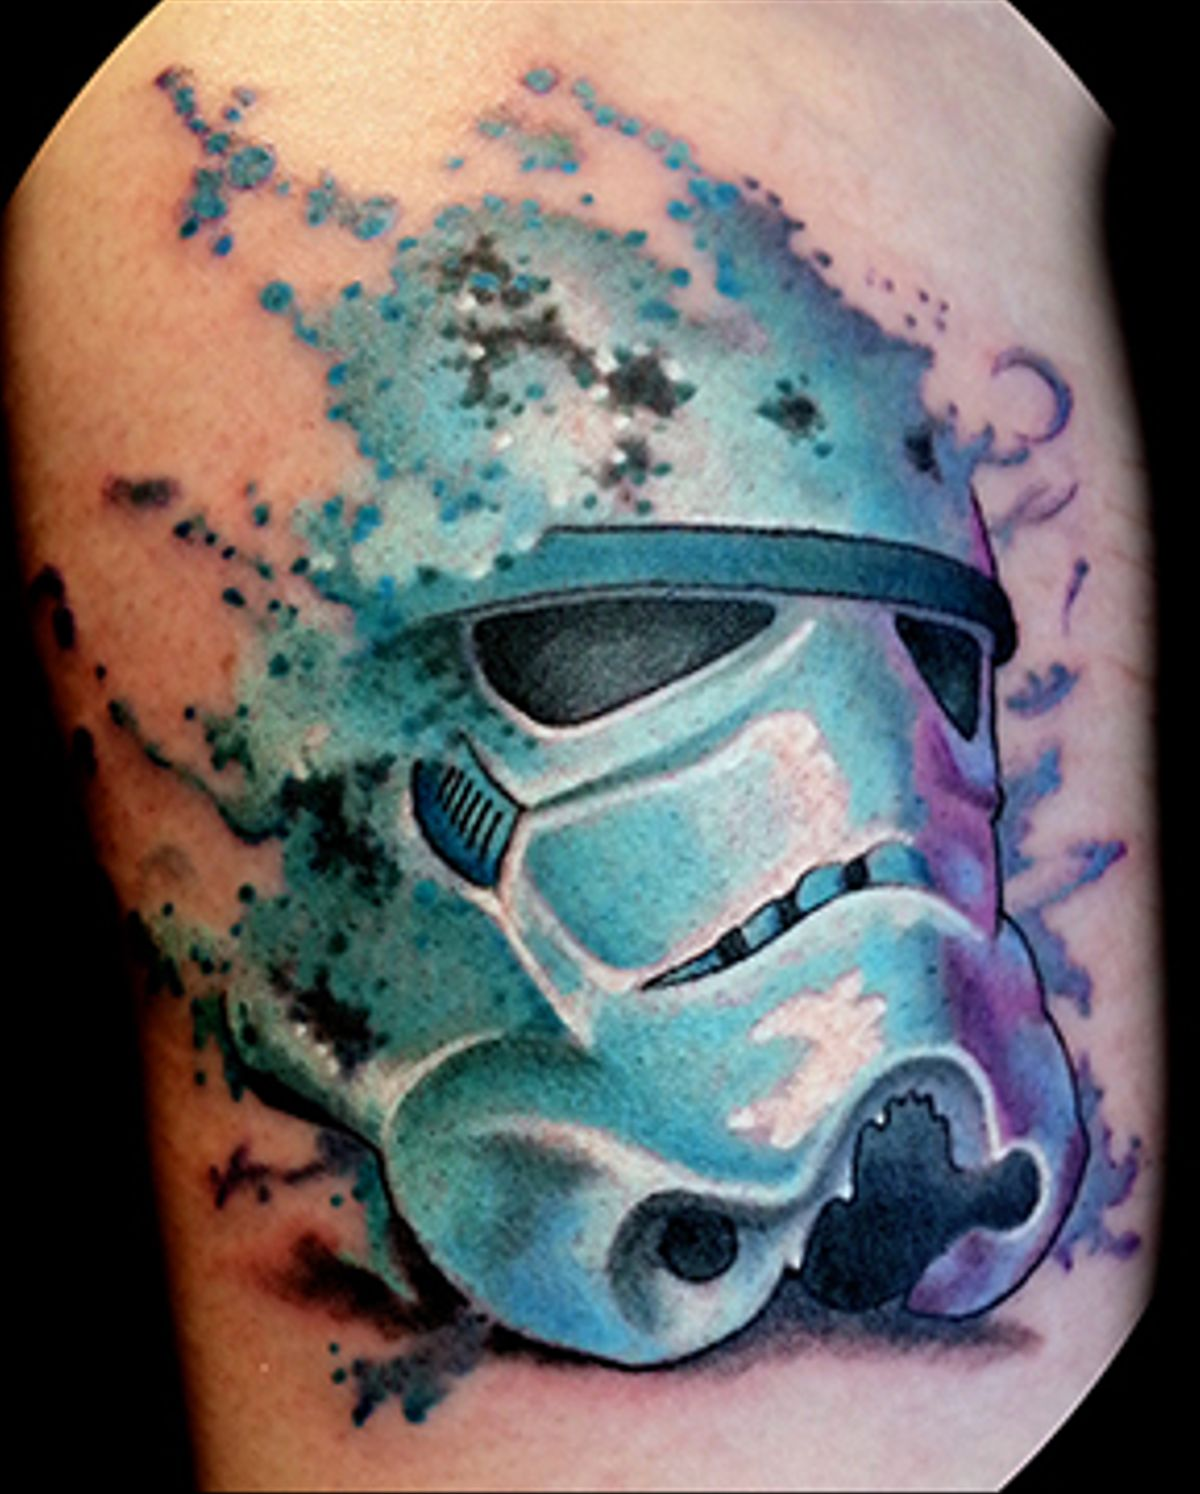 Club-Tattoo-Mike-Bianco-San-Francisco-Pier-39-110